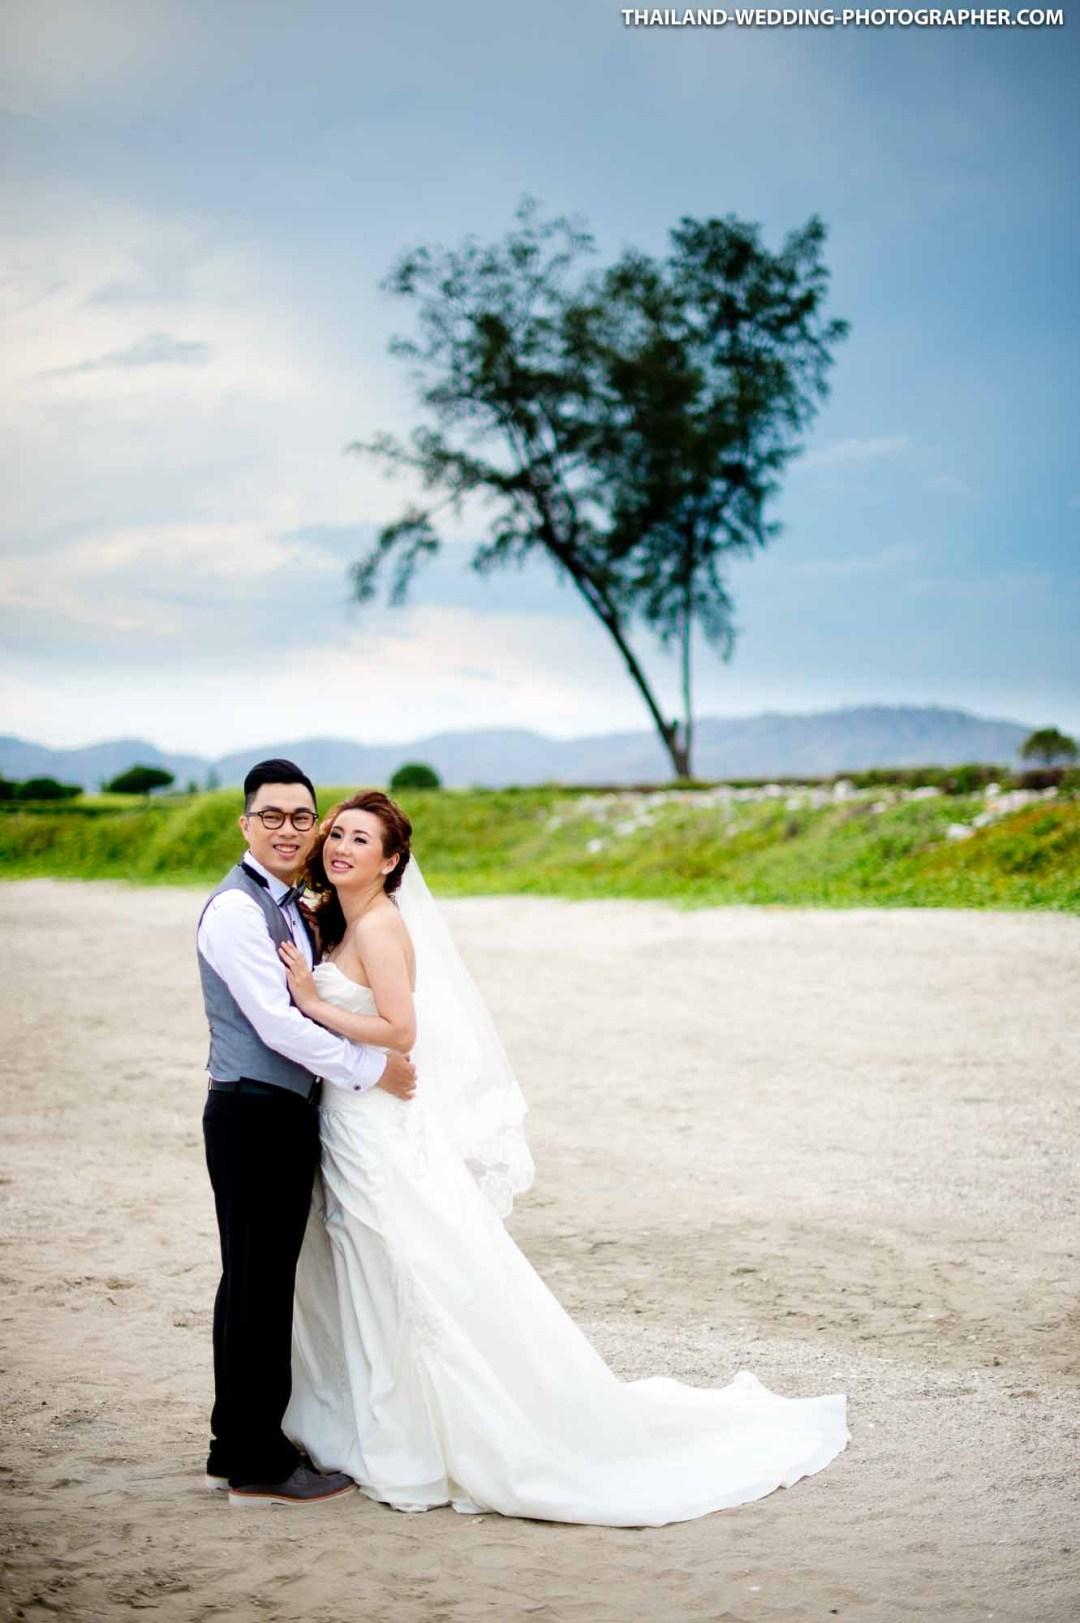 Suan Son Pradiphat Hua Hin Wedding Photography